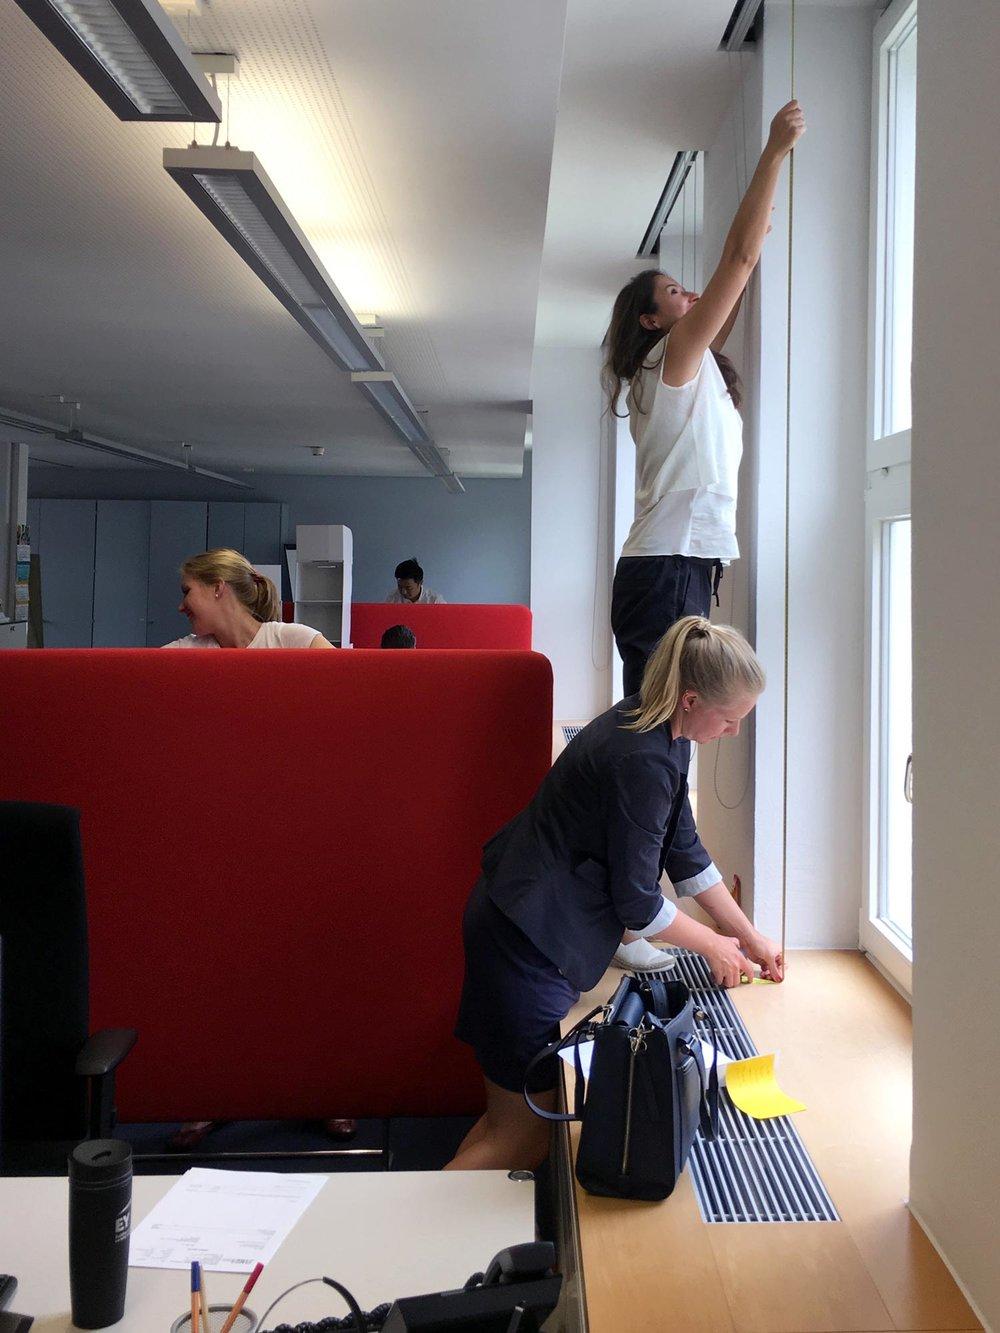 Architecture-London-Design-Freehaus-Workspace-Bahlsen-7.jpg